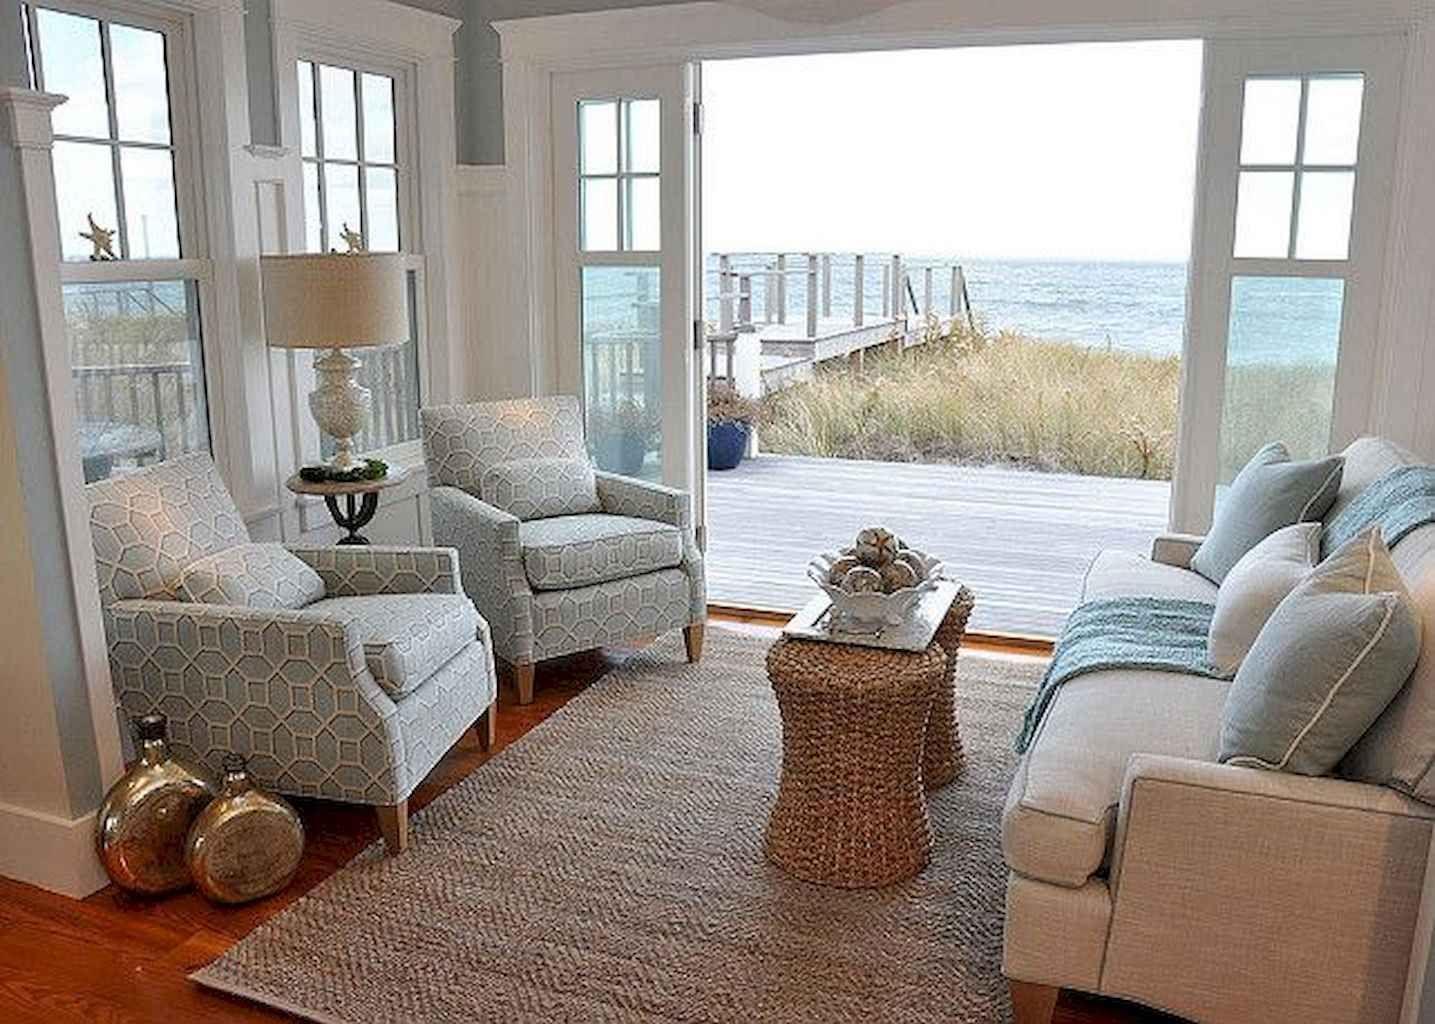 35 cozy coastal living room decorating ideas in 2020 ...